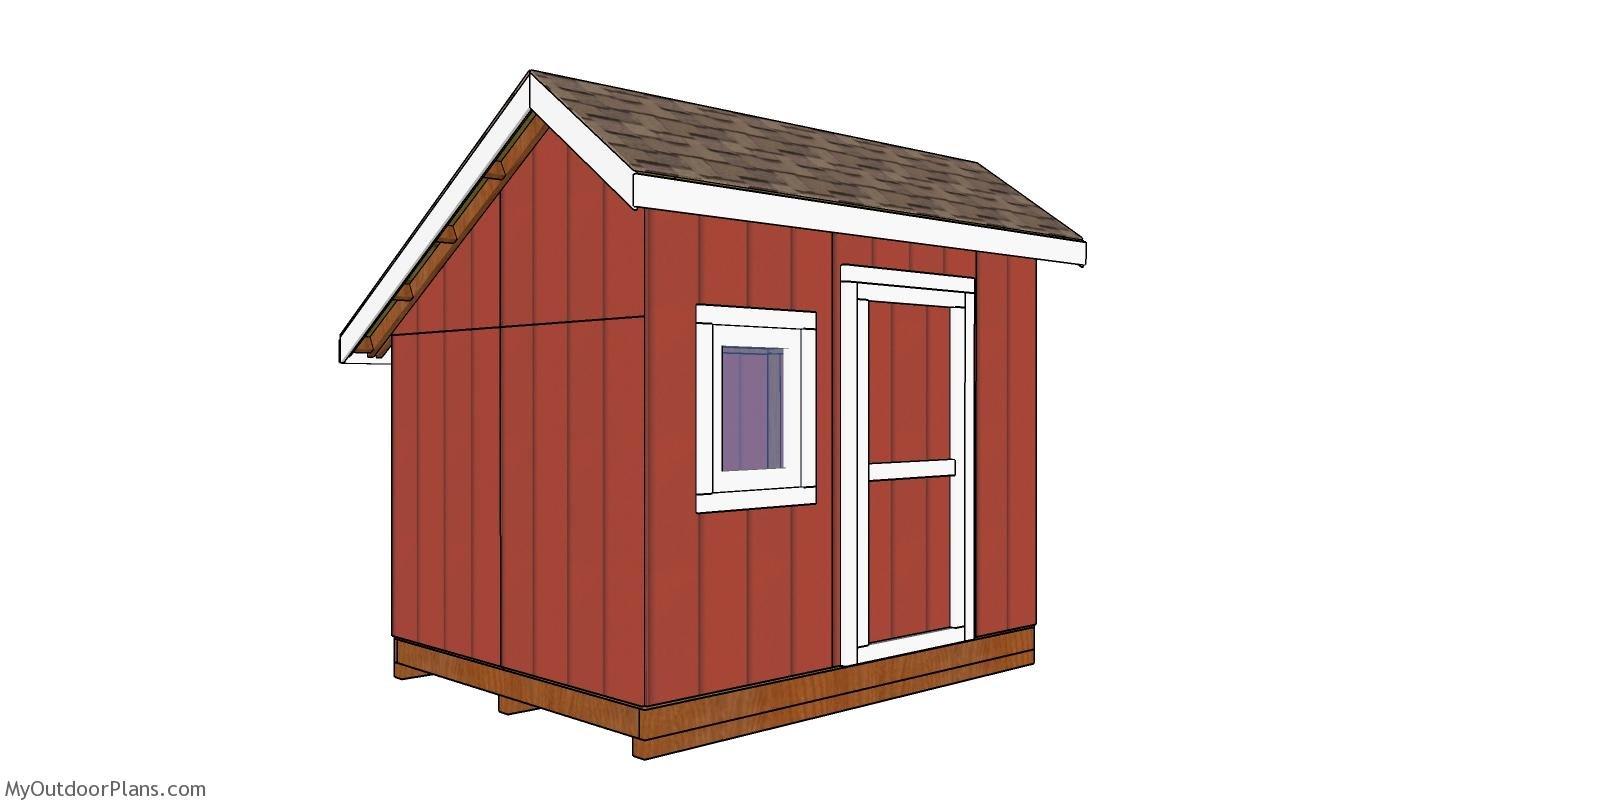 8x10 Saltbox Shed - Free DIY Plans